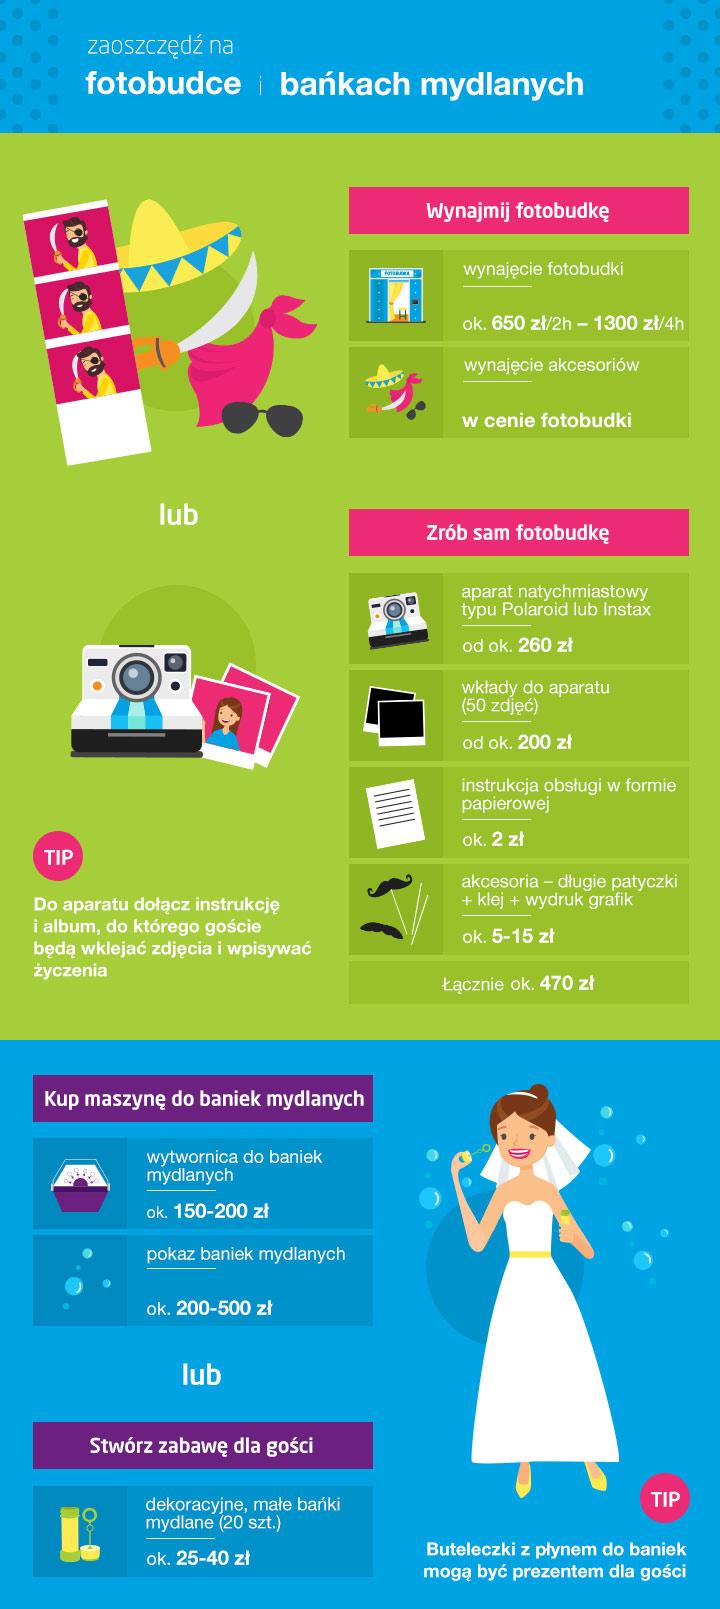 Ile kosztuje fotobudka - infografika